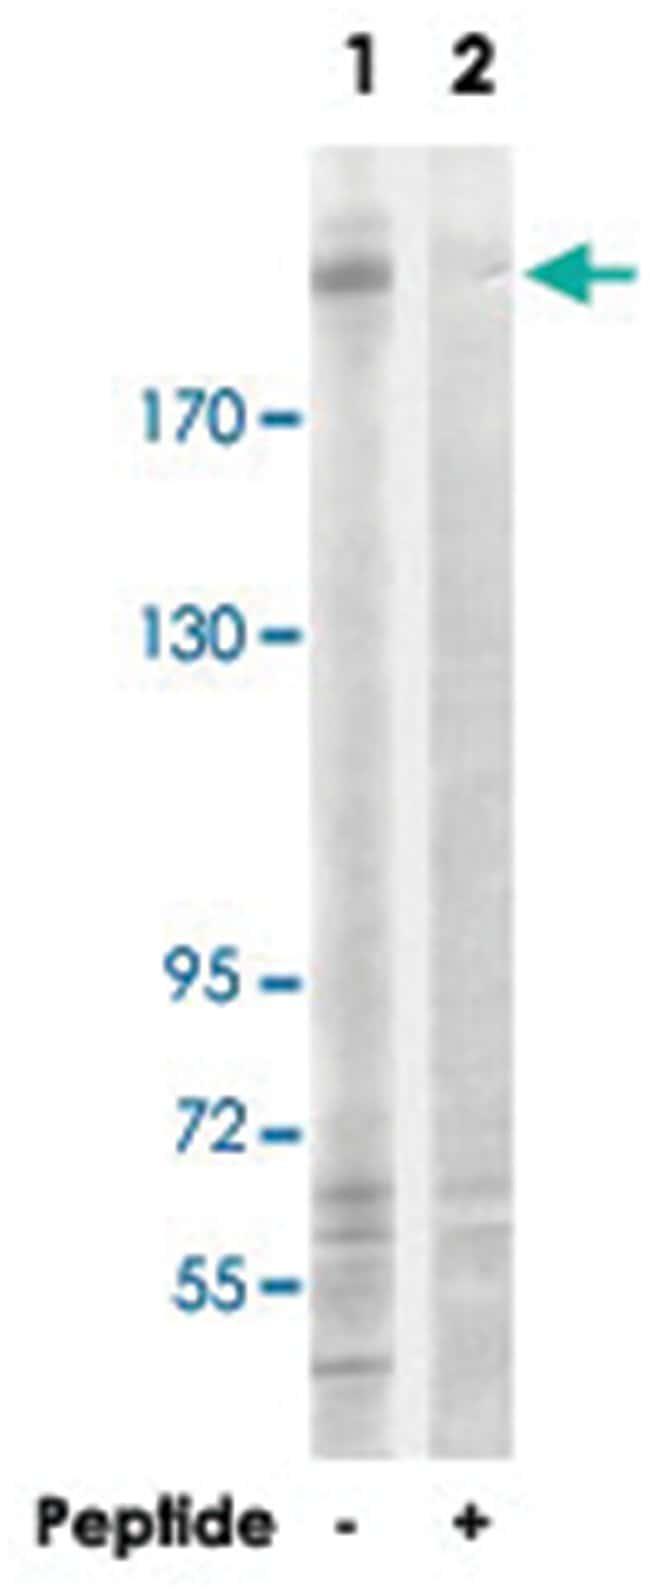 TUBGCP6 Rabbit anti-Human, Polyclonal Antibody, Abnova 100µg; Unlabeled:Life